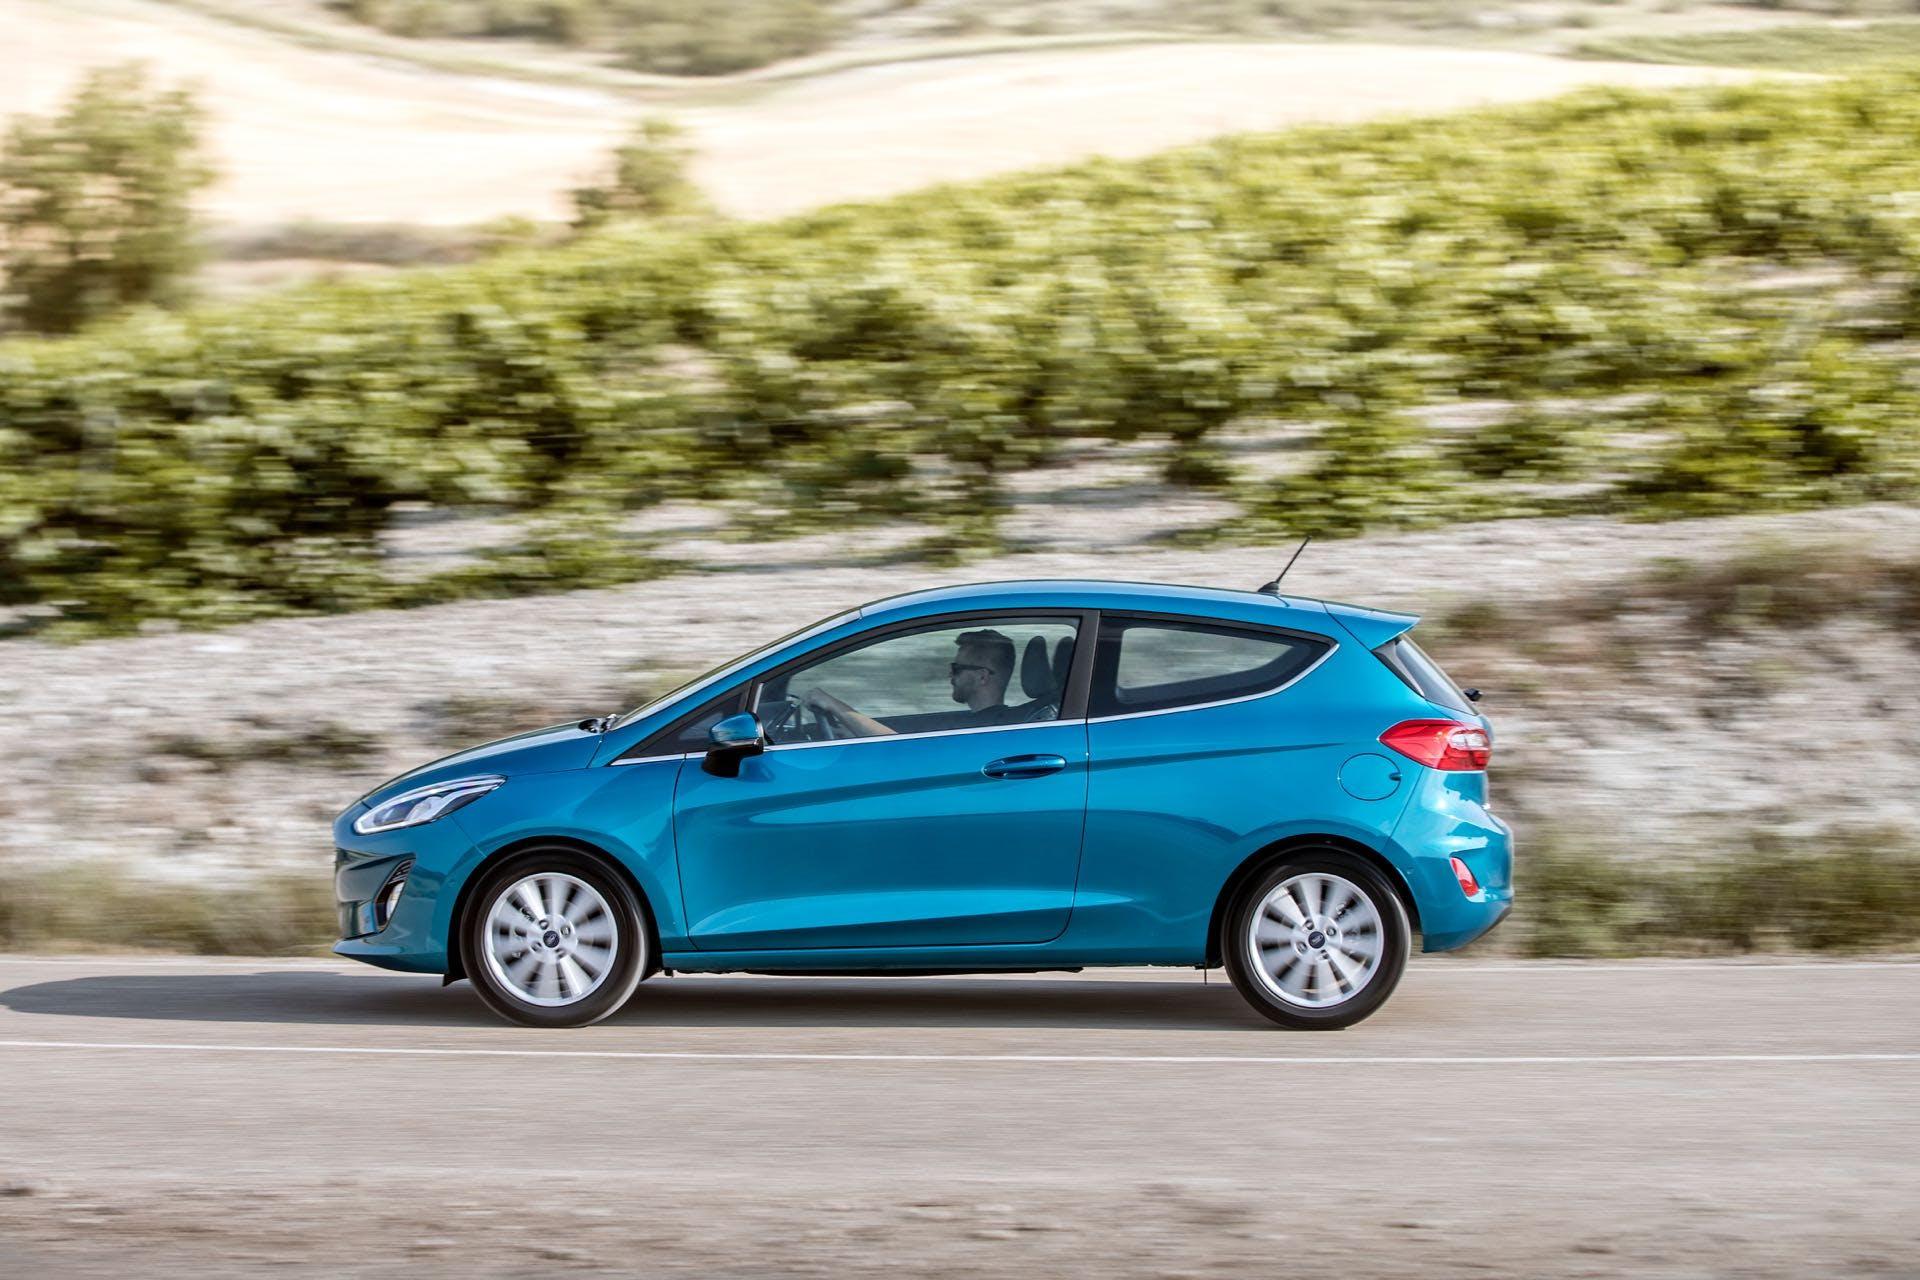 Ford Fiesta Titanium blu vista laterale, migliori auto gpl